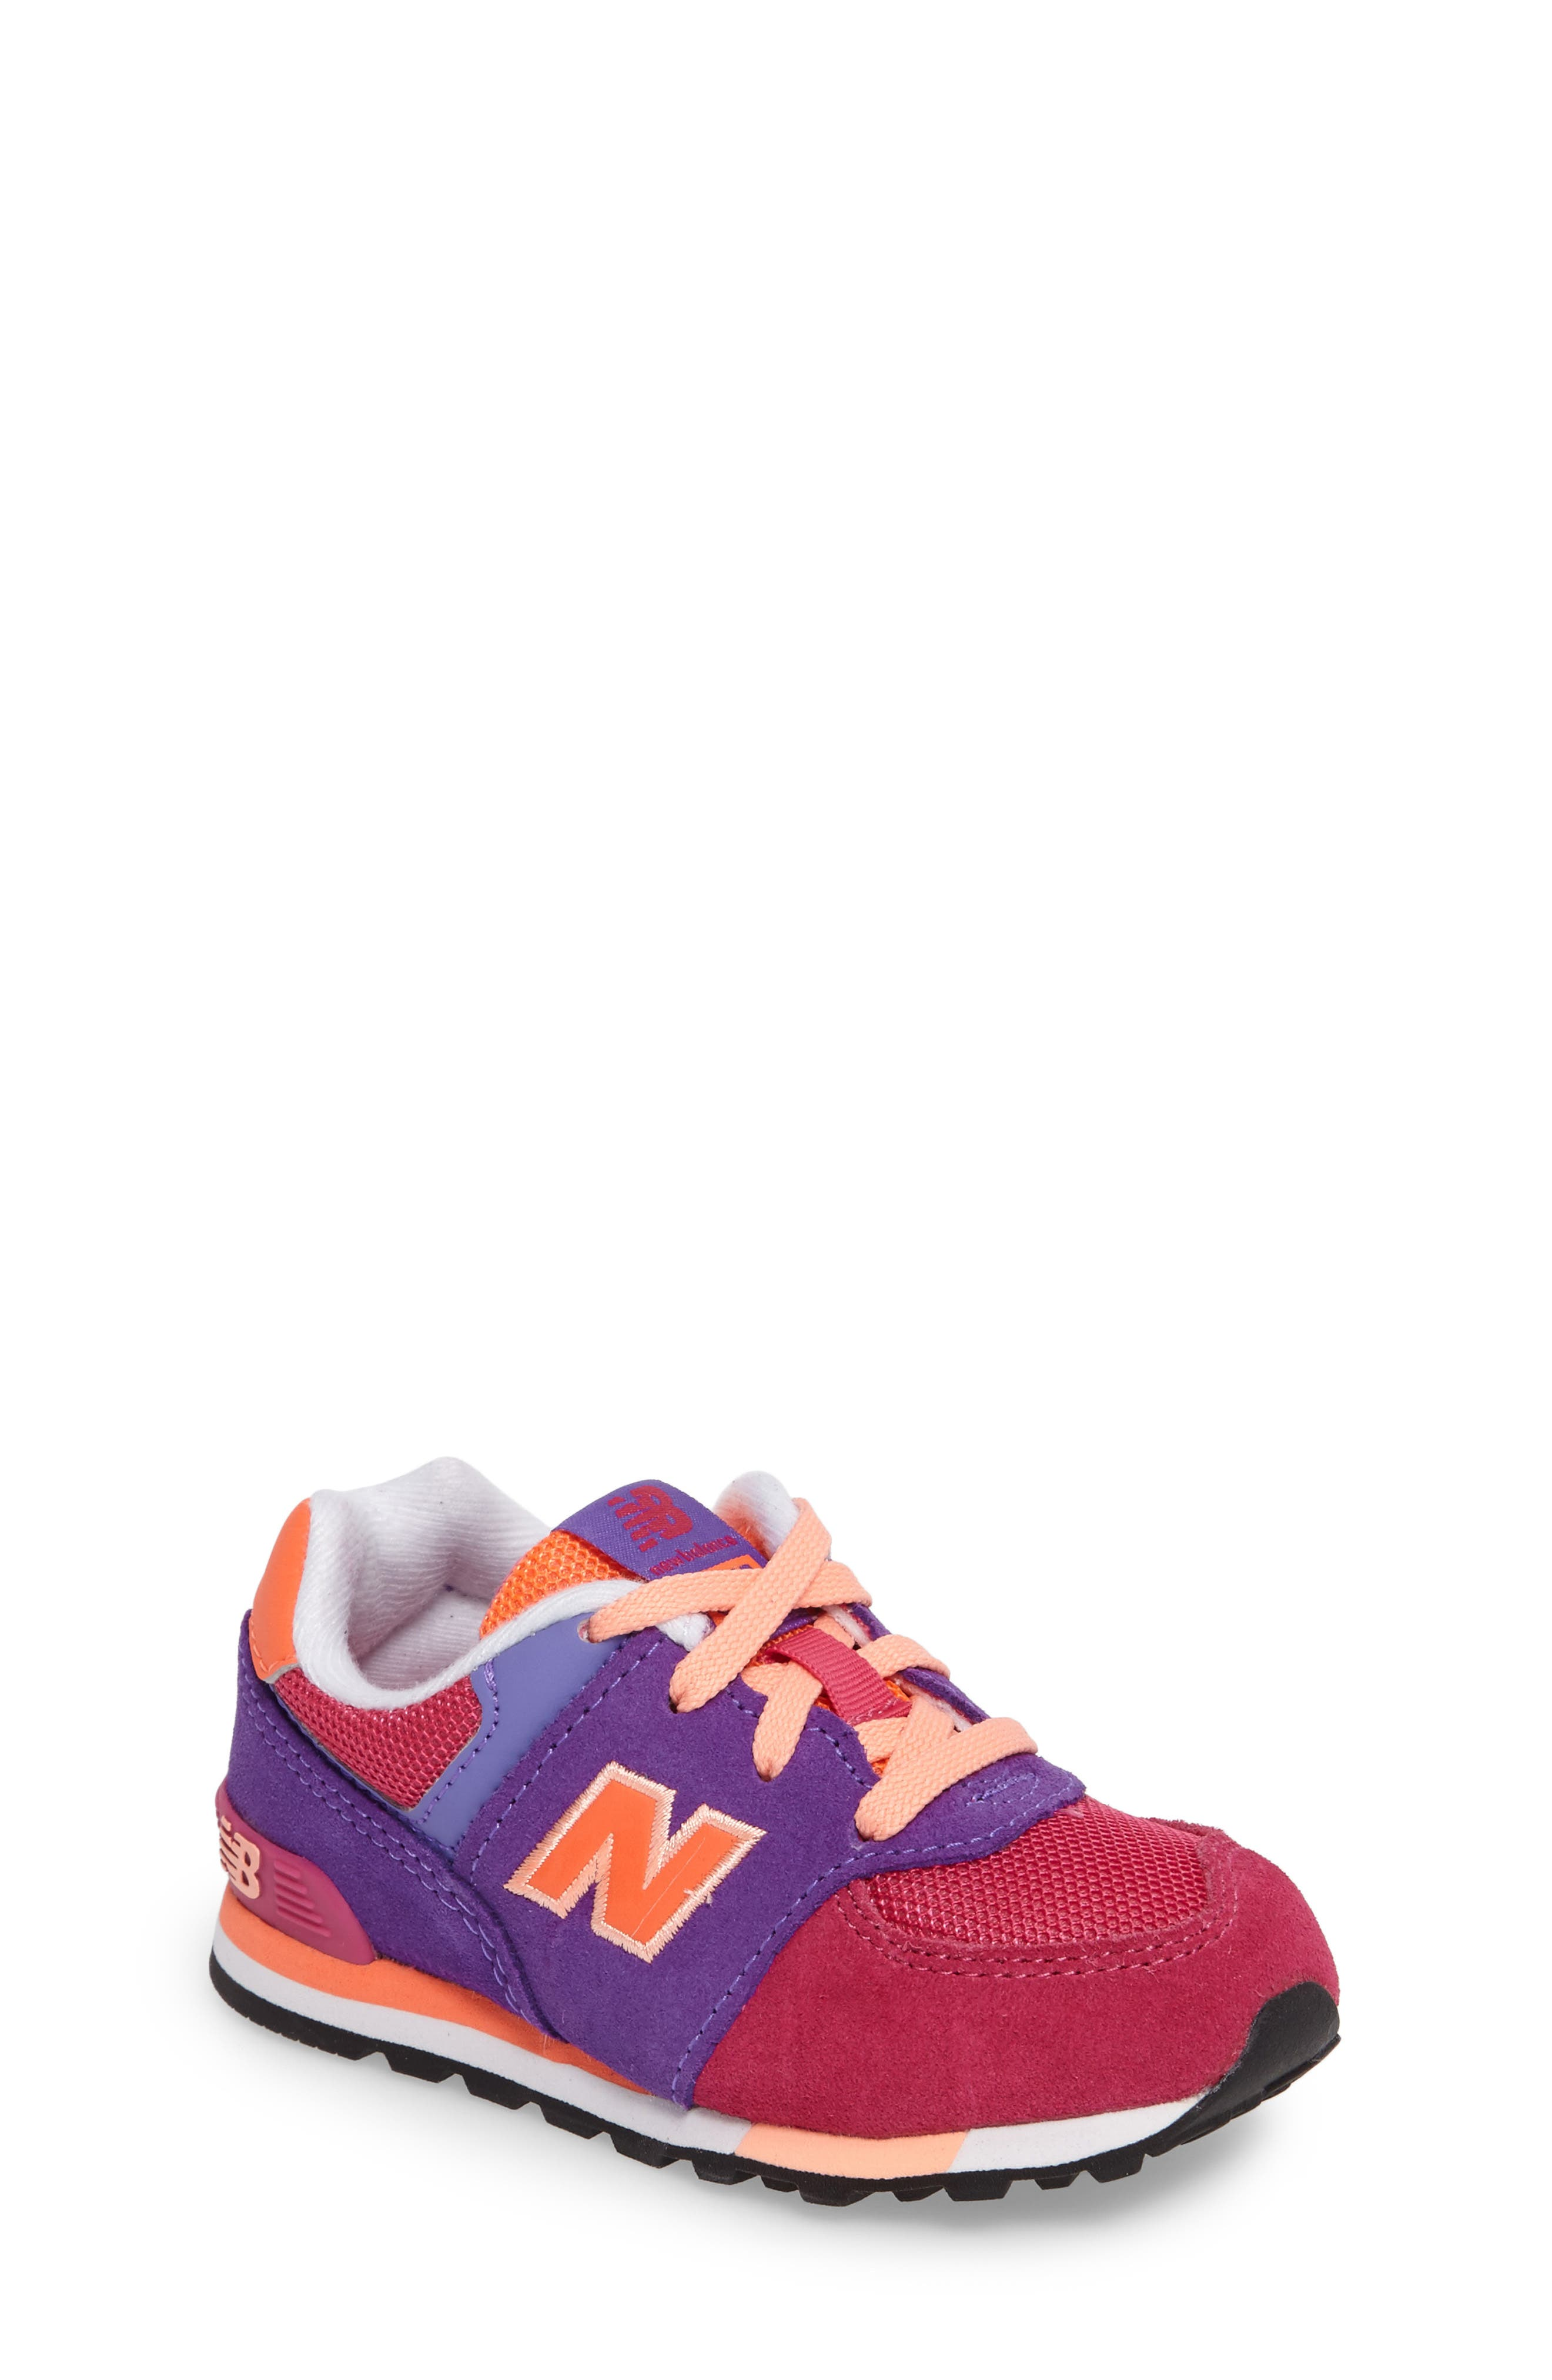 NEW BALANCE 574 Cut & Paste Sneaker